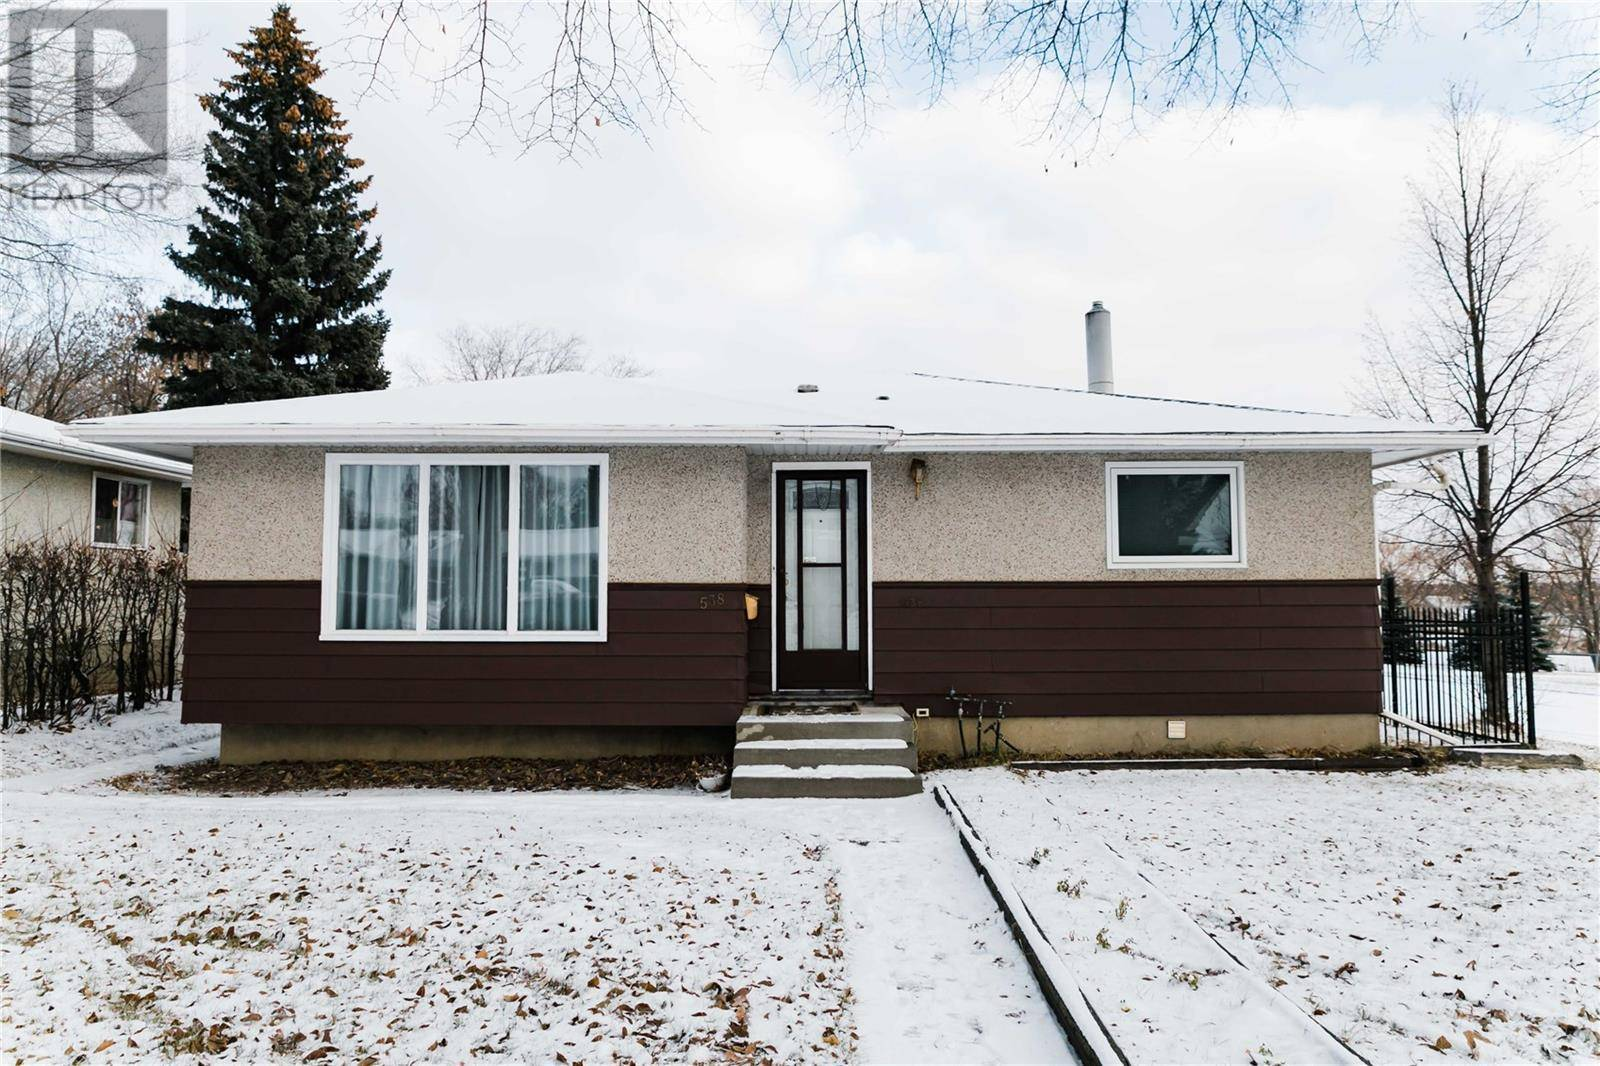 House for sale at 538 T Ave S Saskatoon Saskatchewan - MLS: SK790908